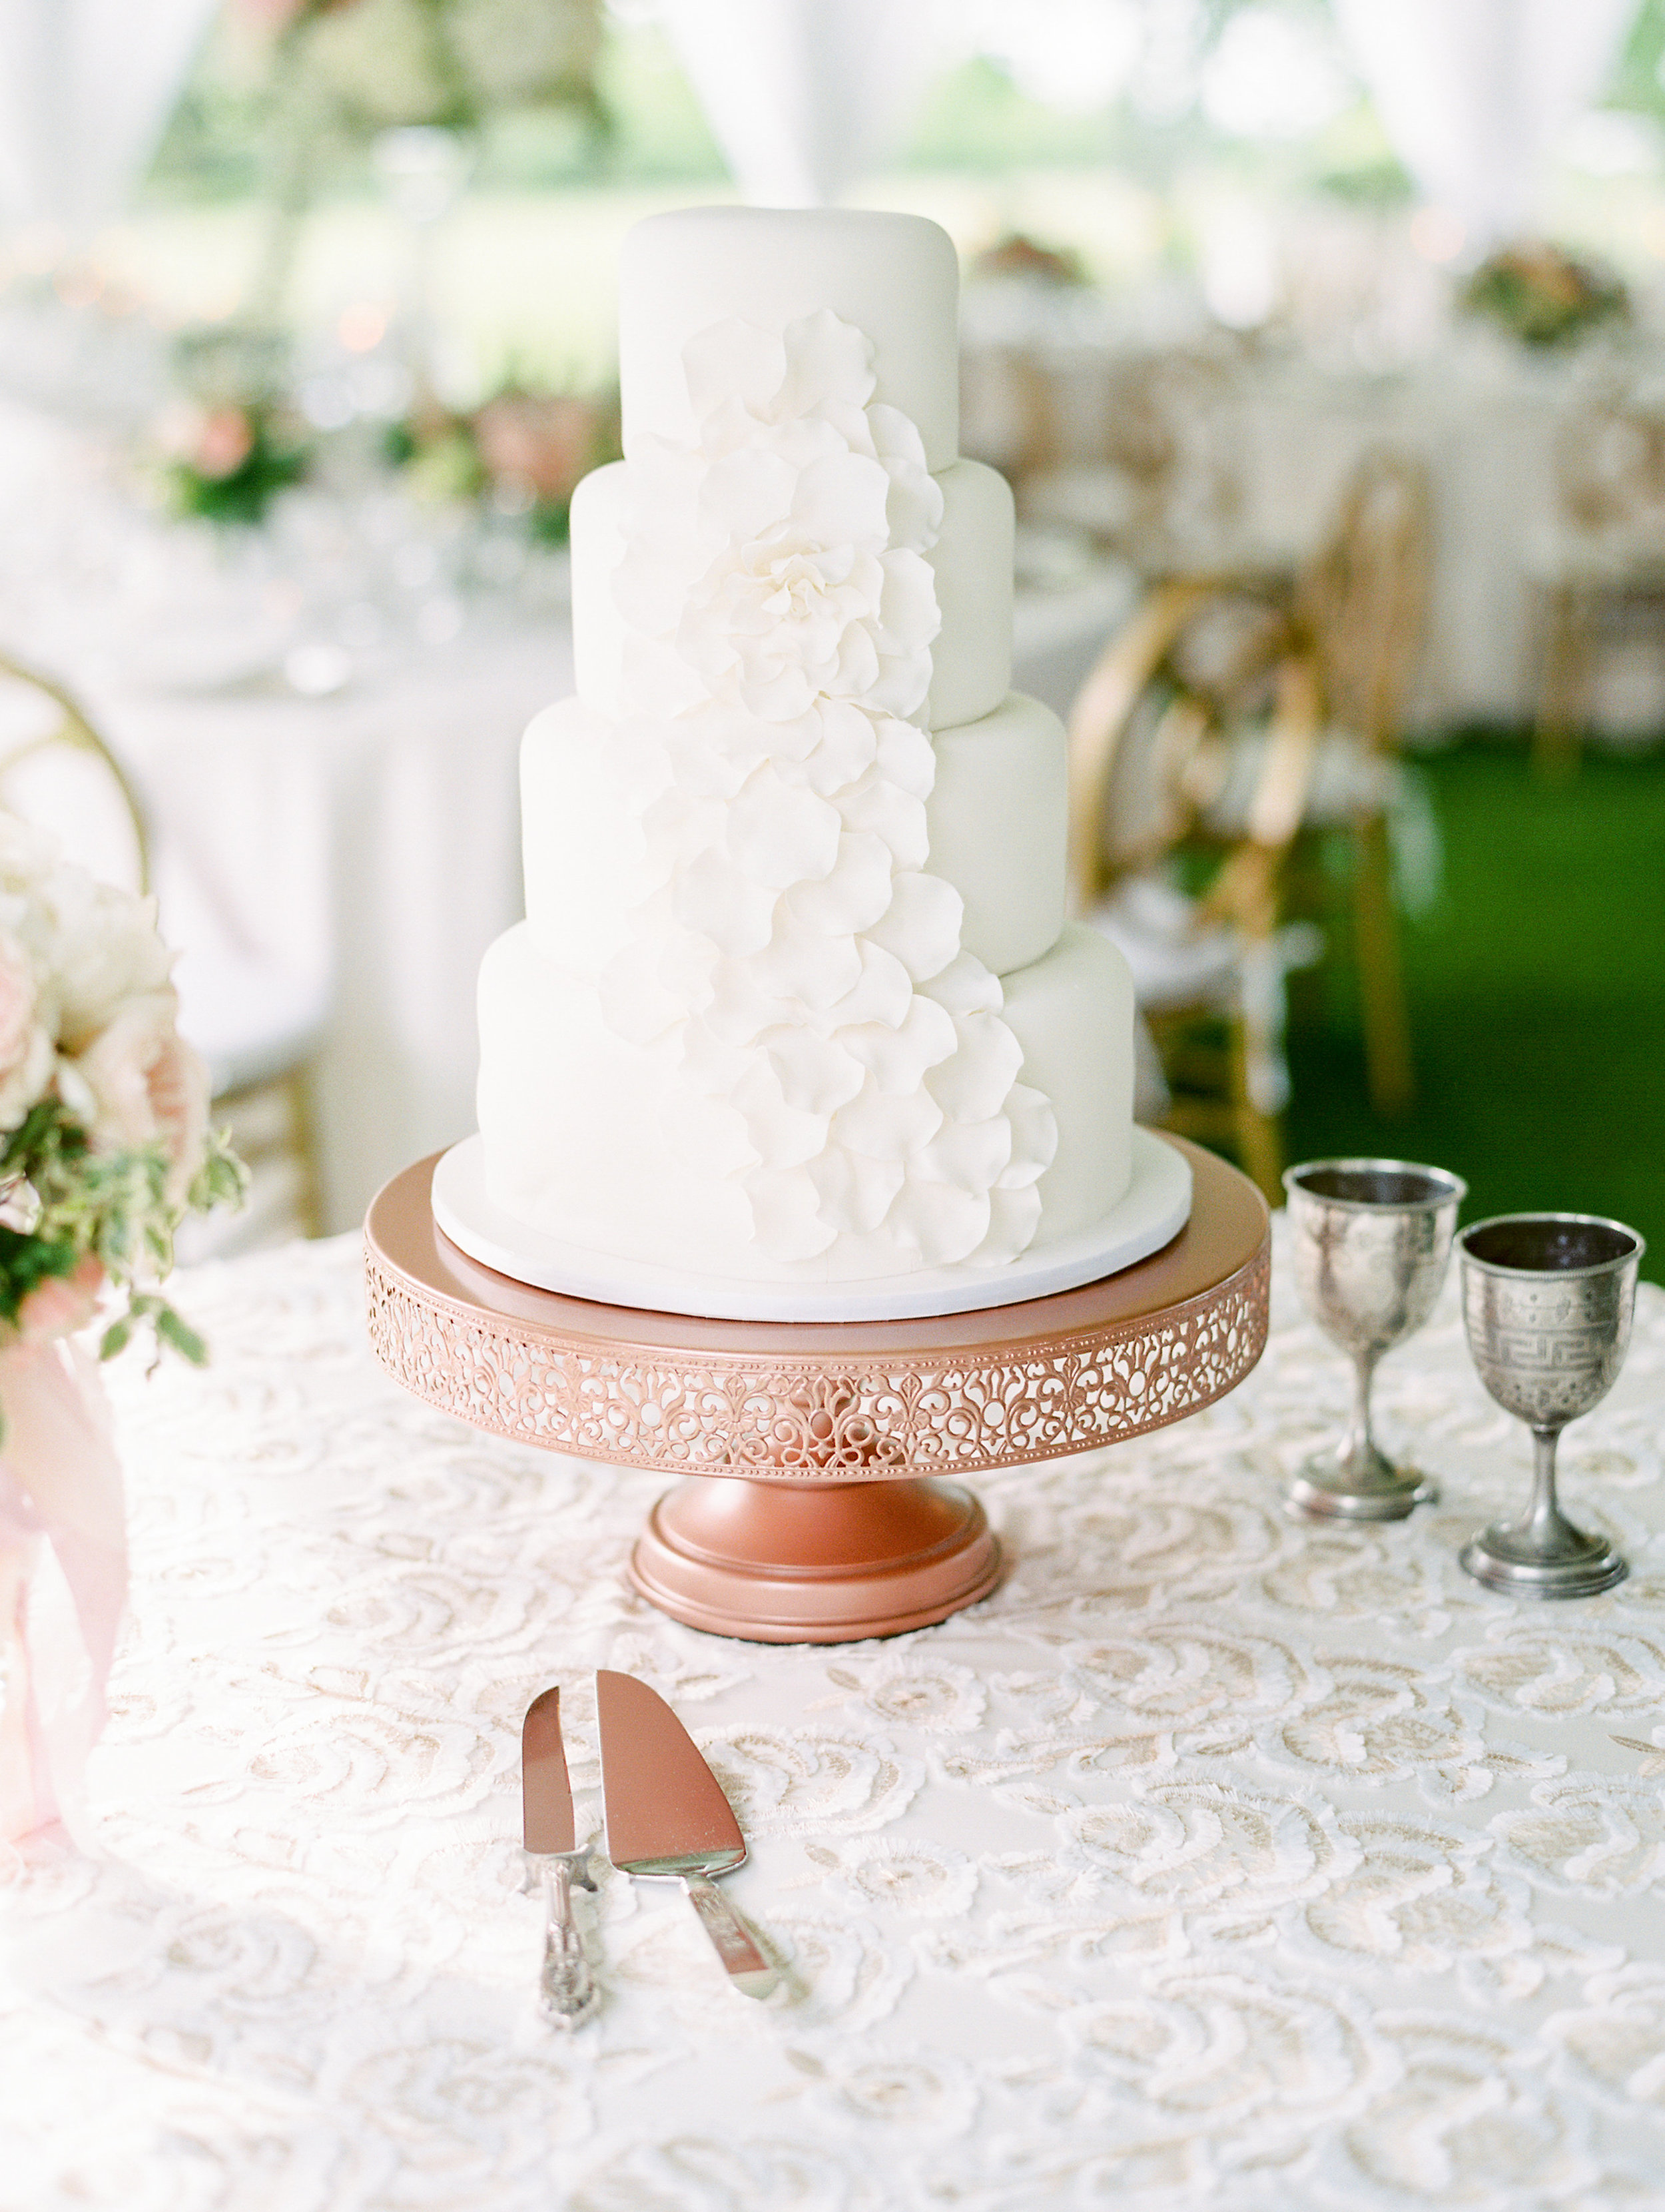 Coffman+Wedding+Reception+Details-90.jpg